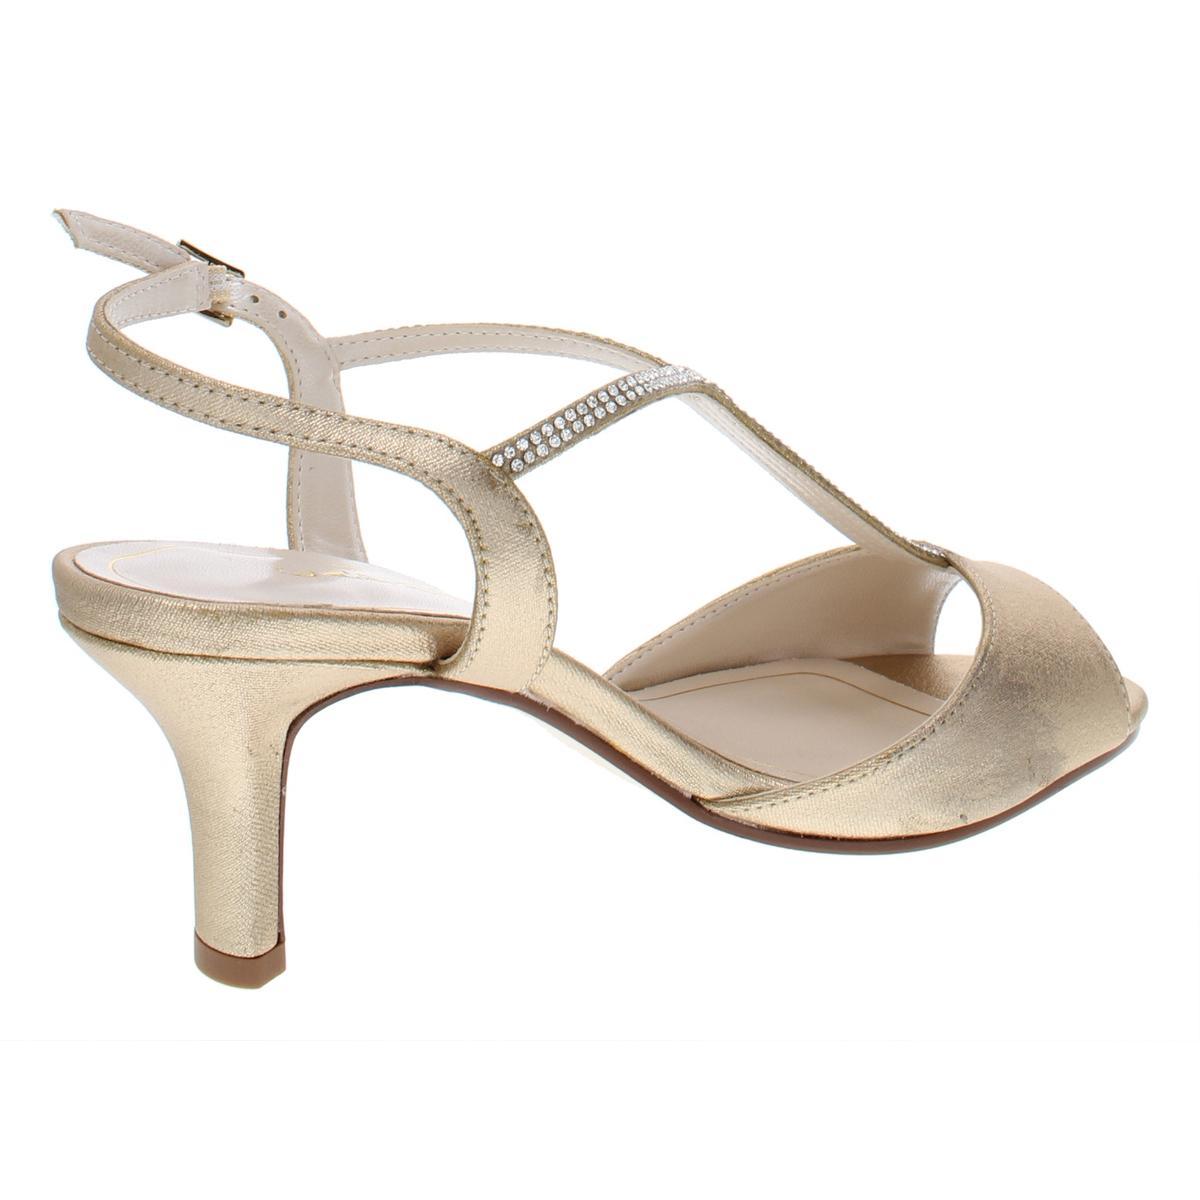 Caparros-Womens-Delicia-Rhinestone-Open-Toe-Evening-Heels-Shoes-BHFO-9353 thumbnail 6